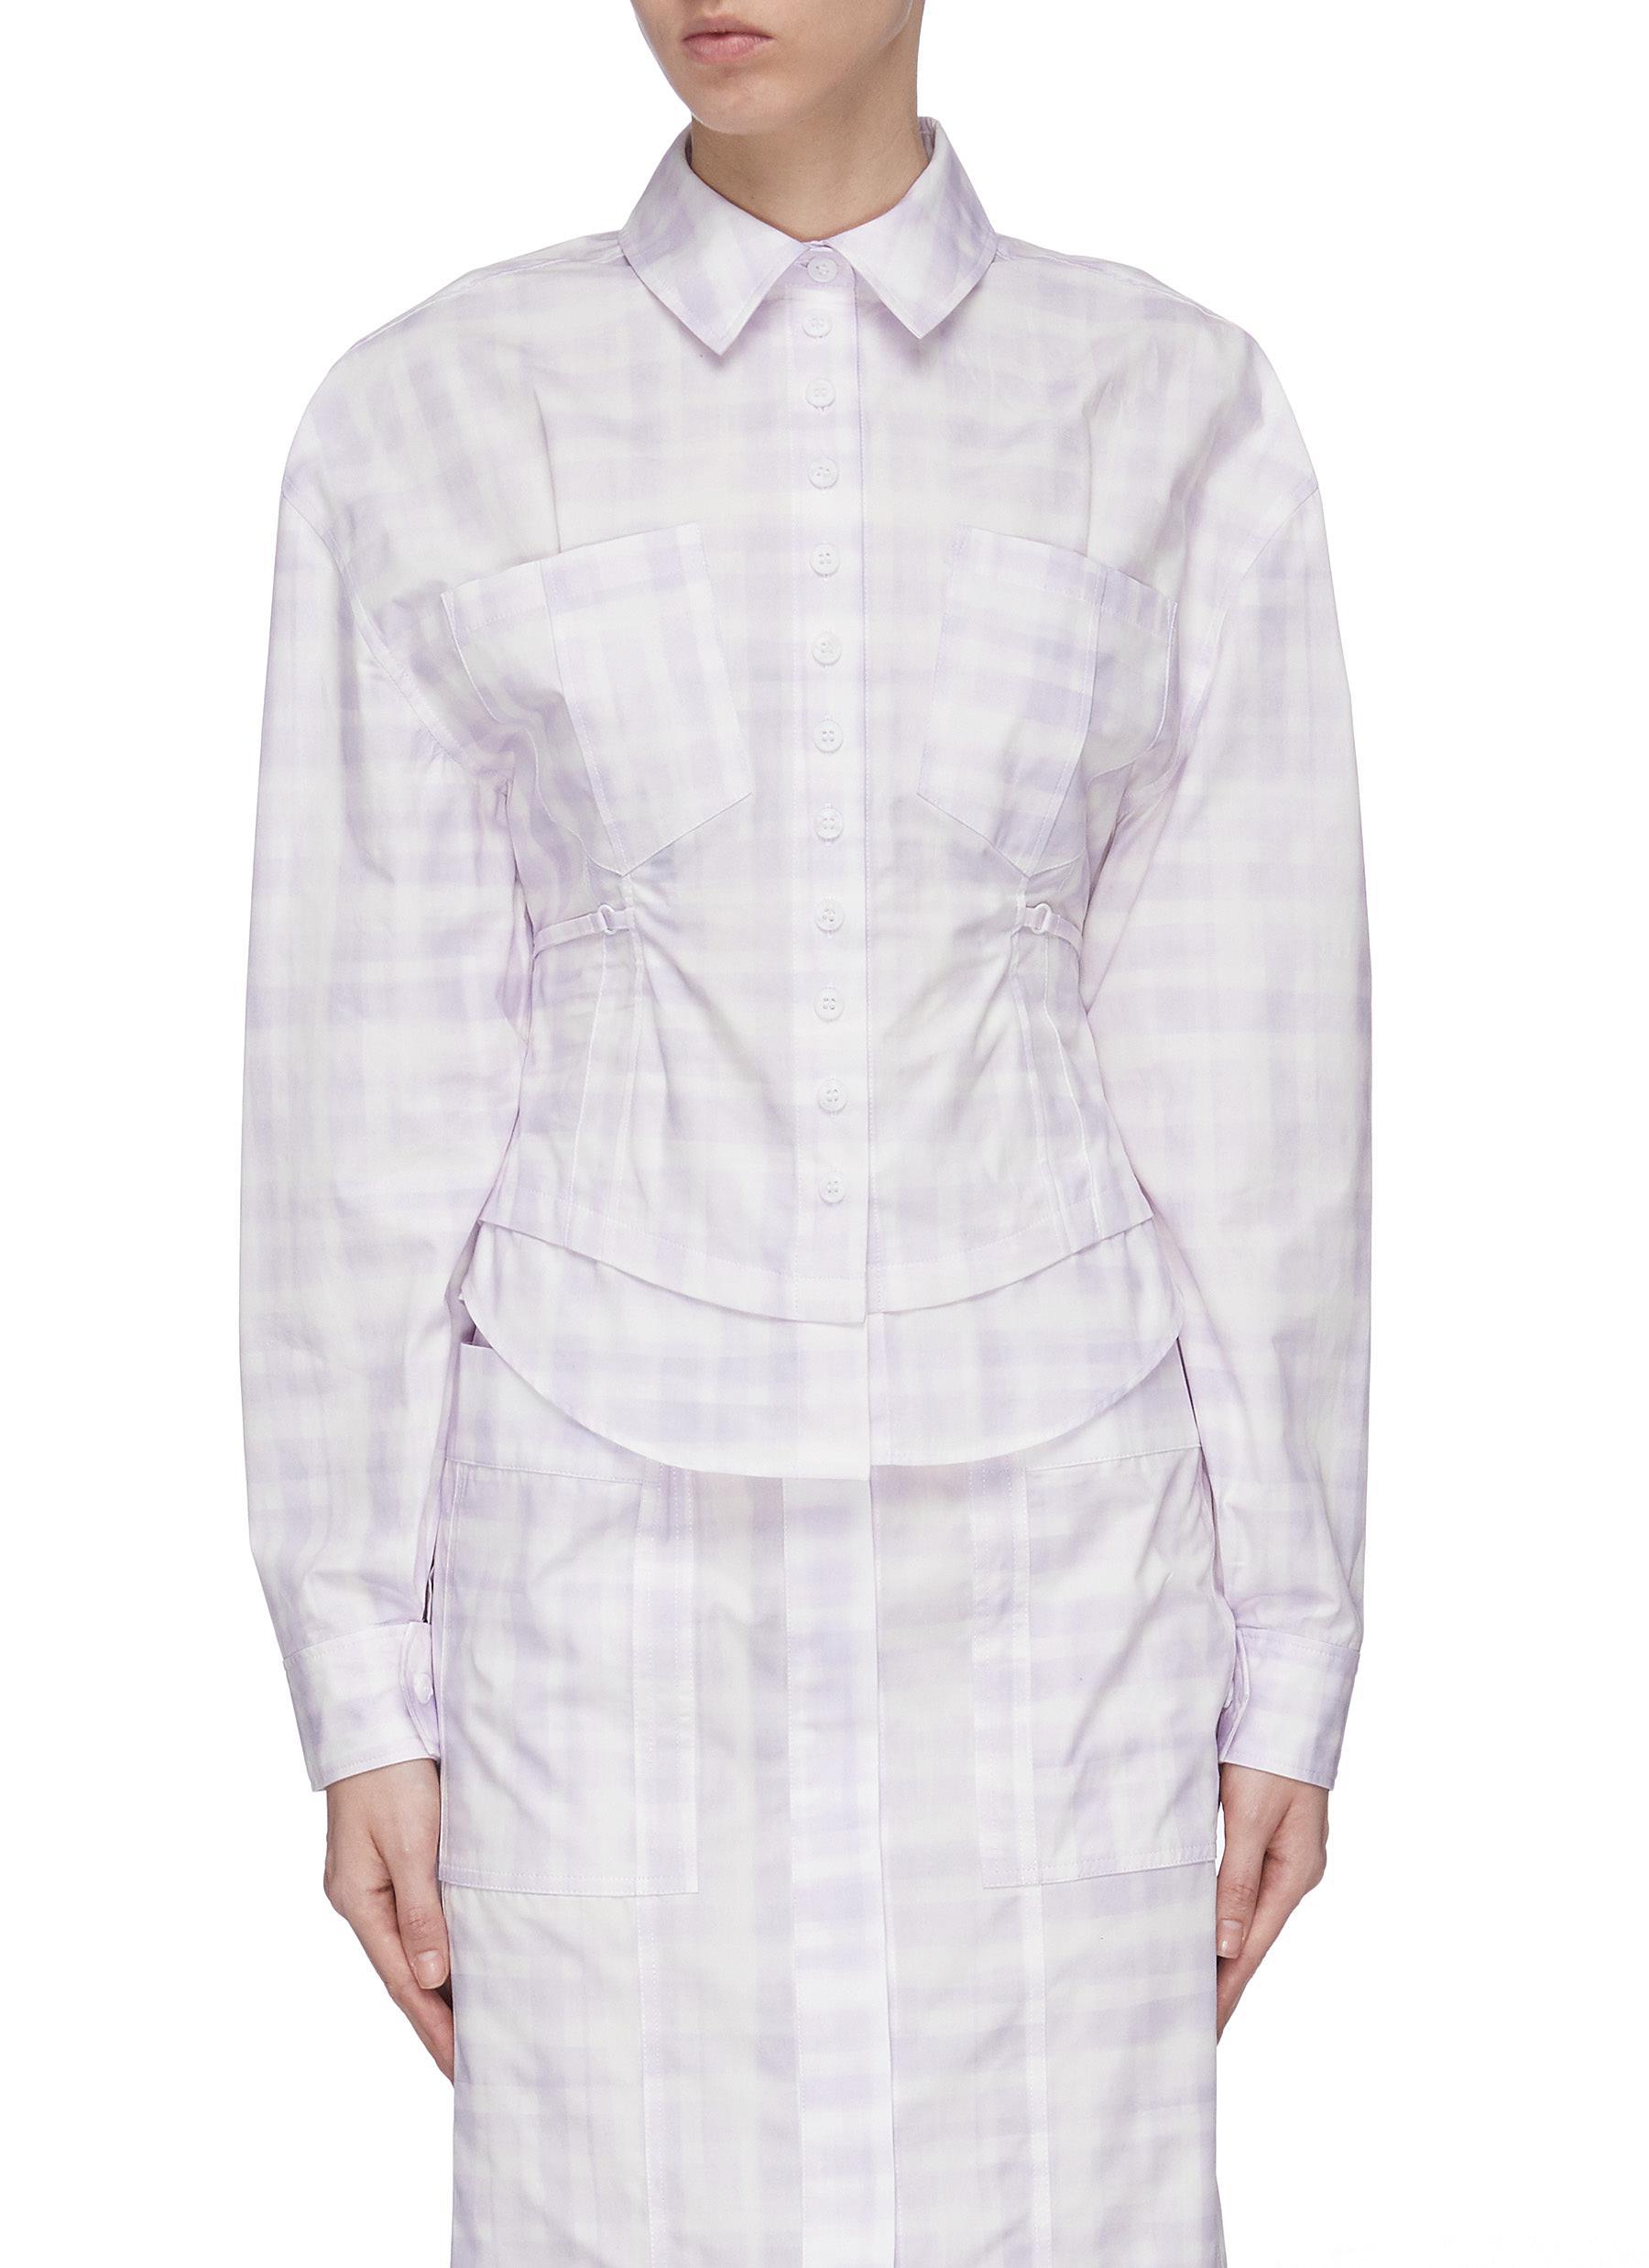 Buy Jacquemus Tops Cut Out Back Check Shirt